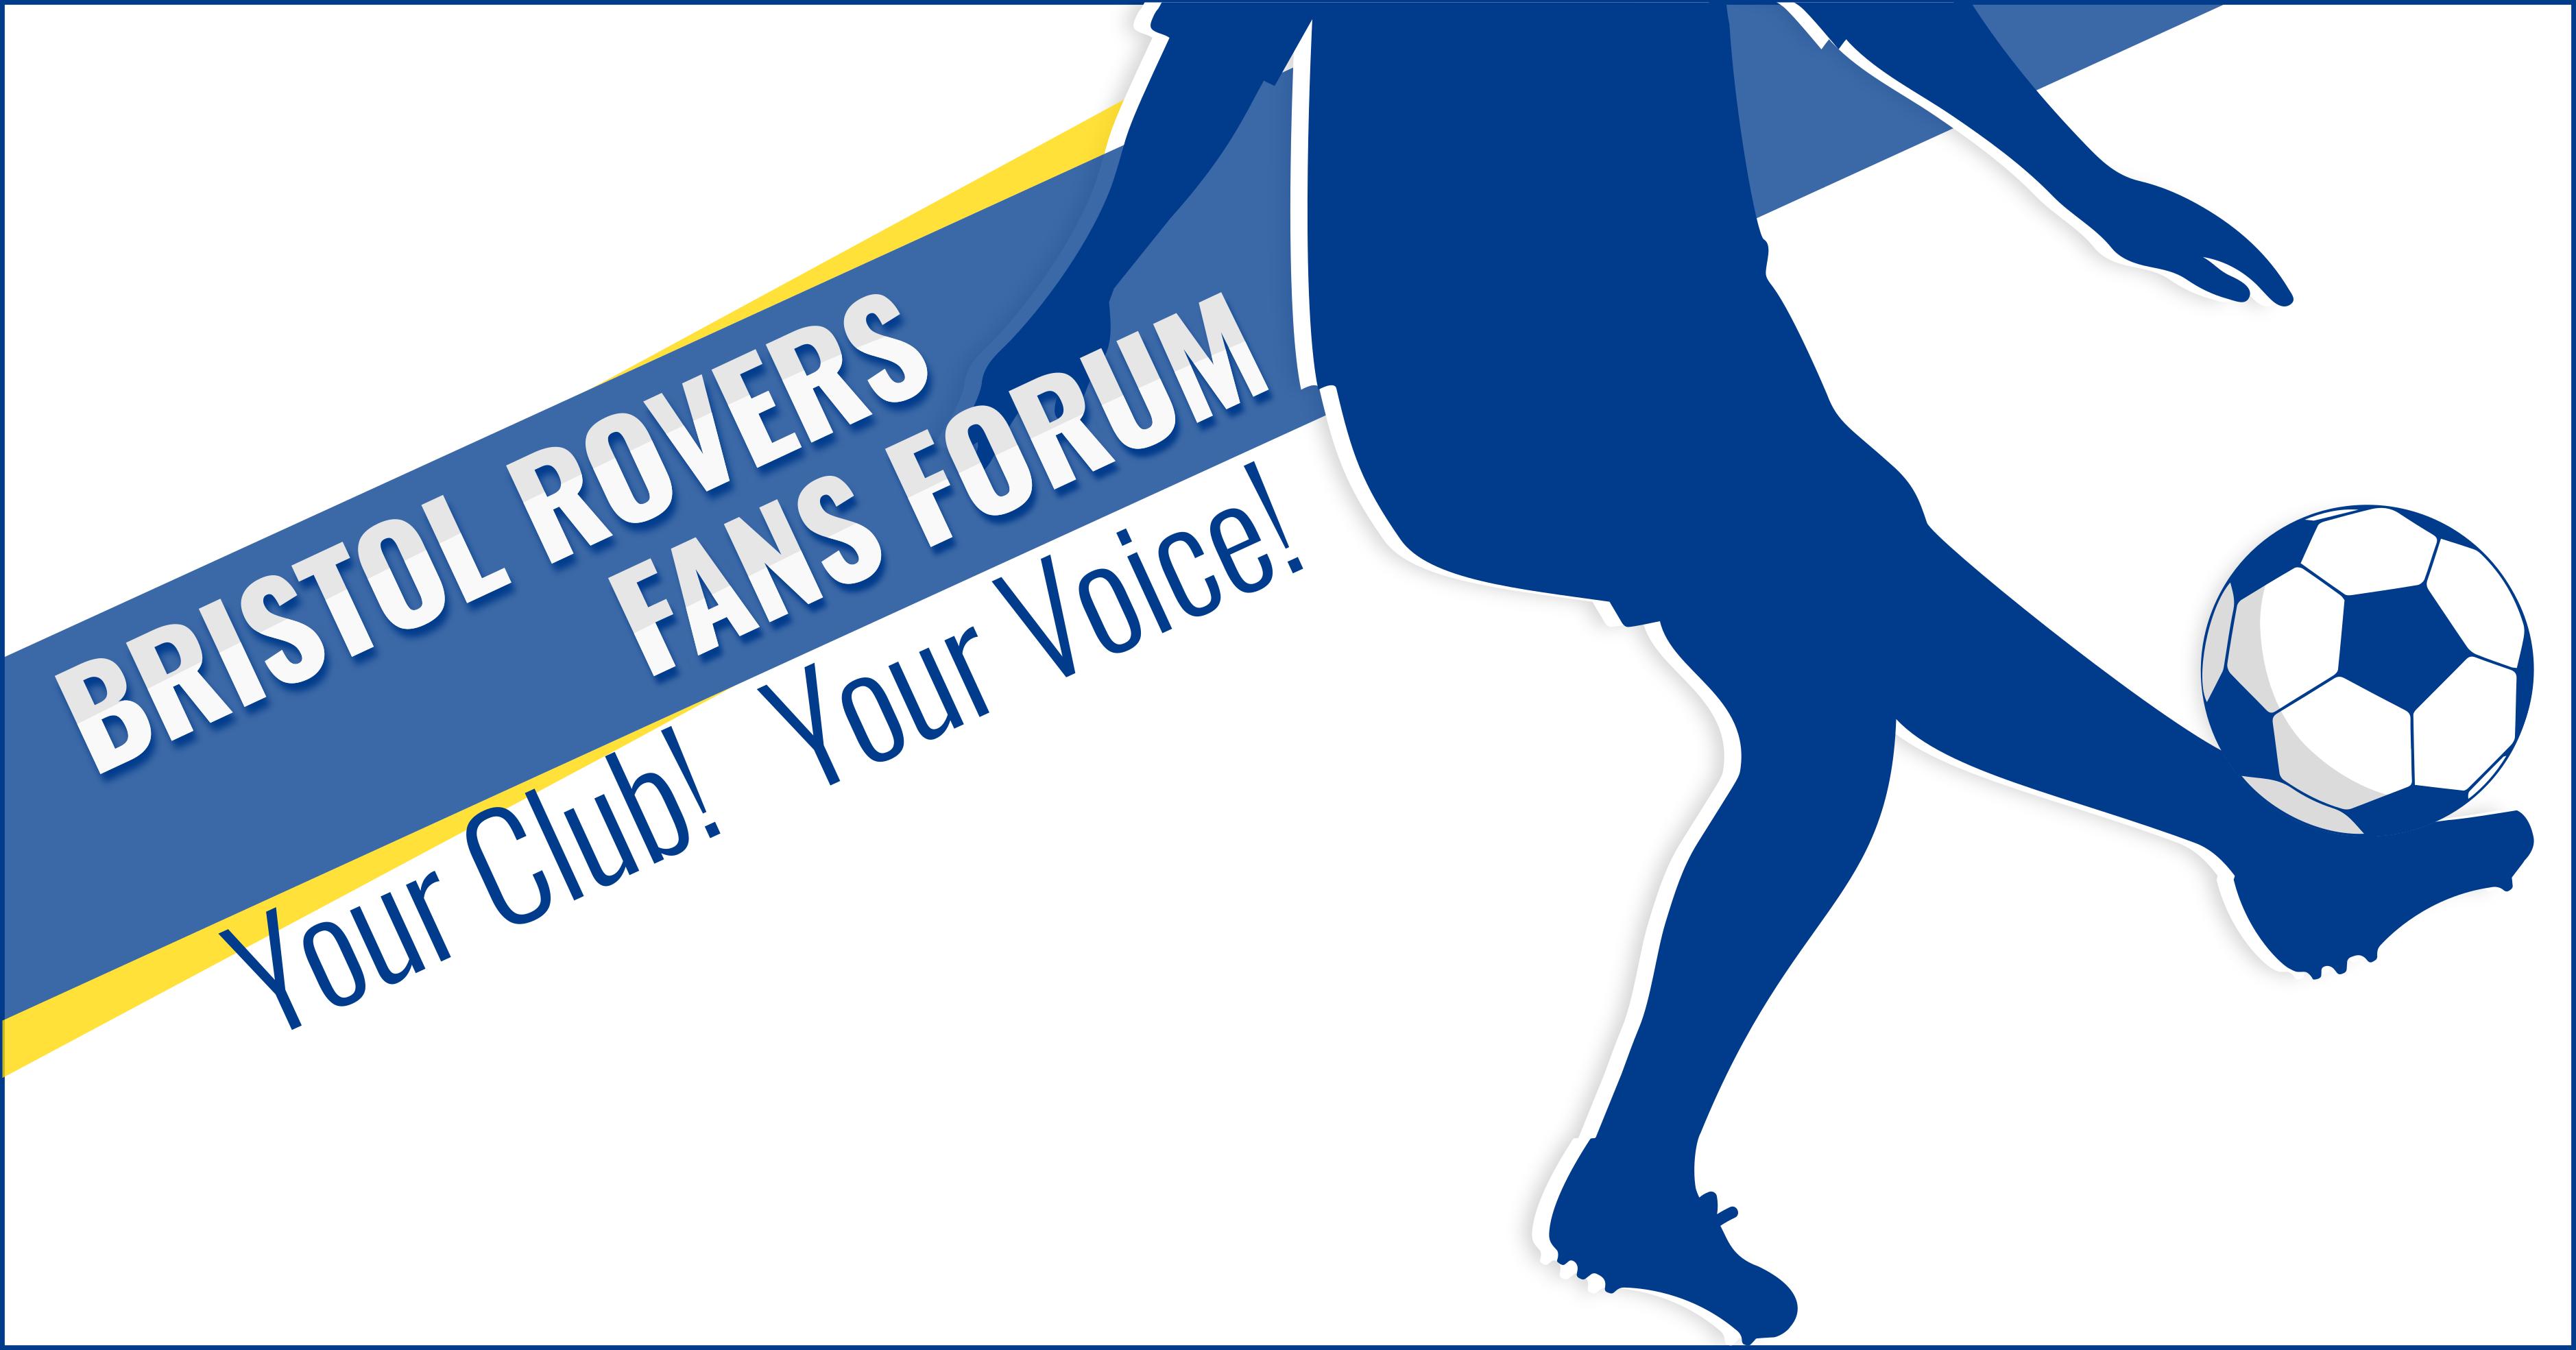 Bristol Rovers Forum